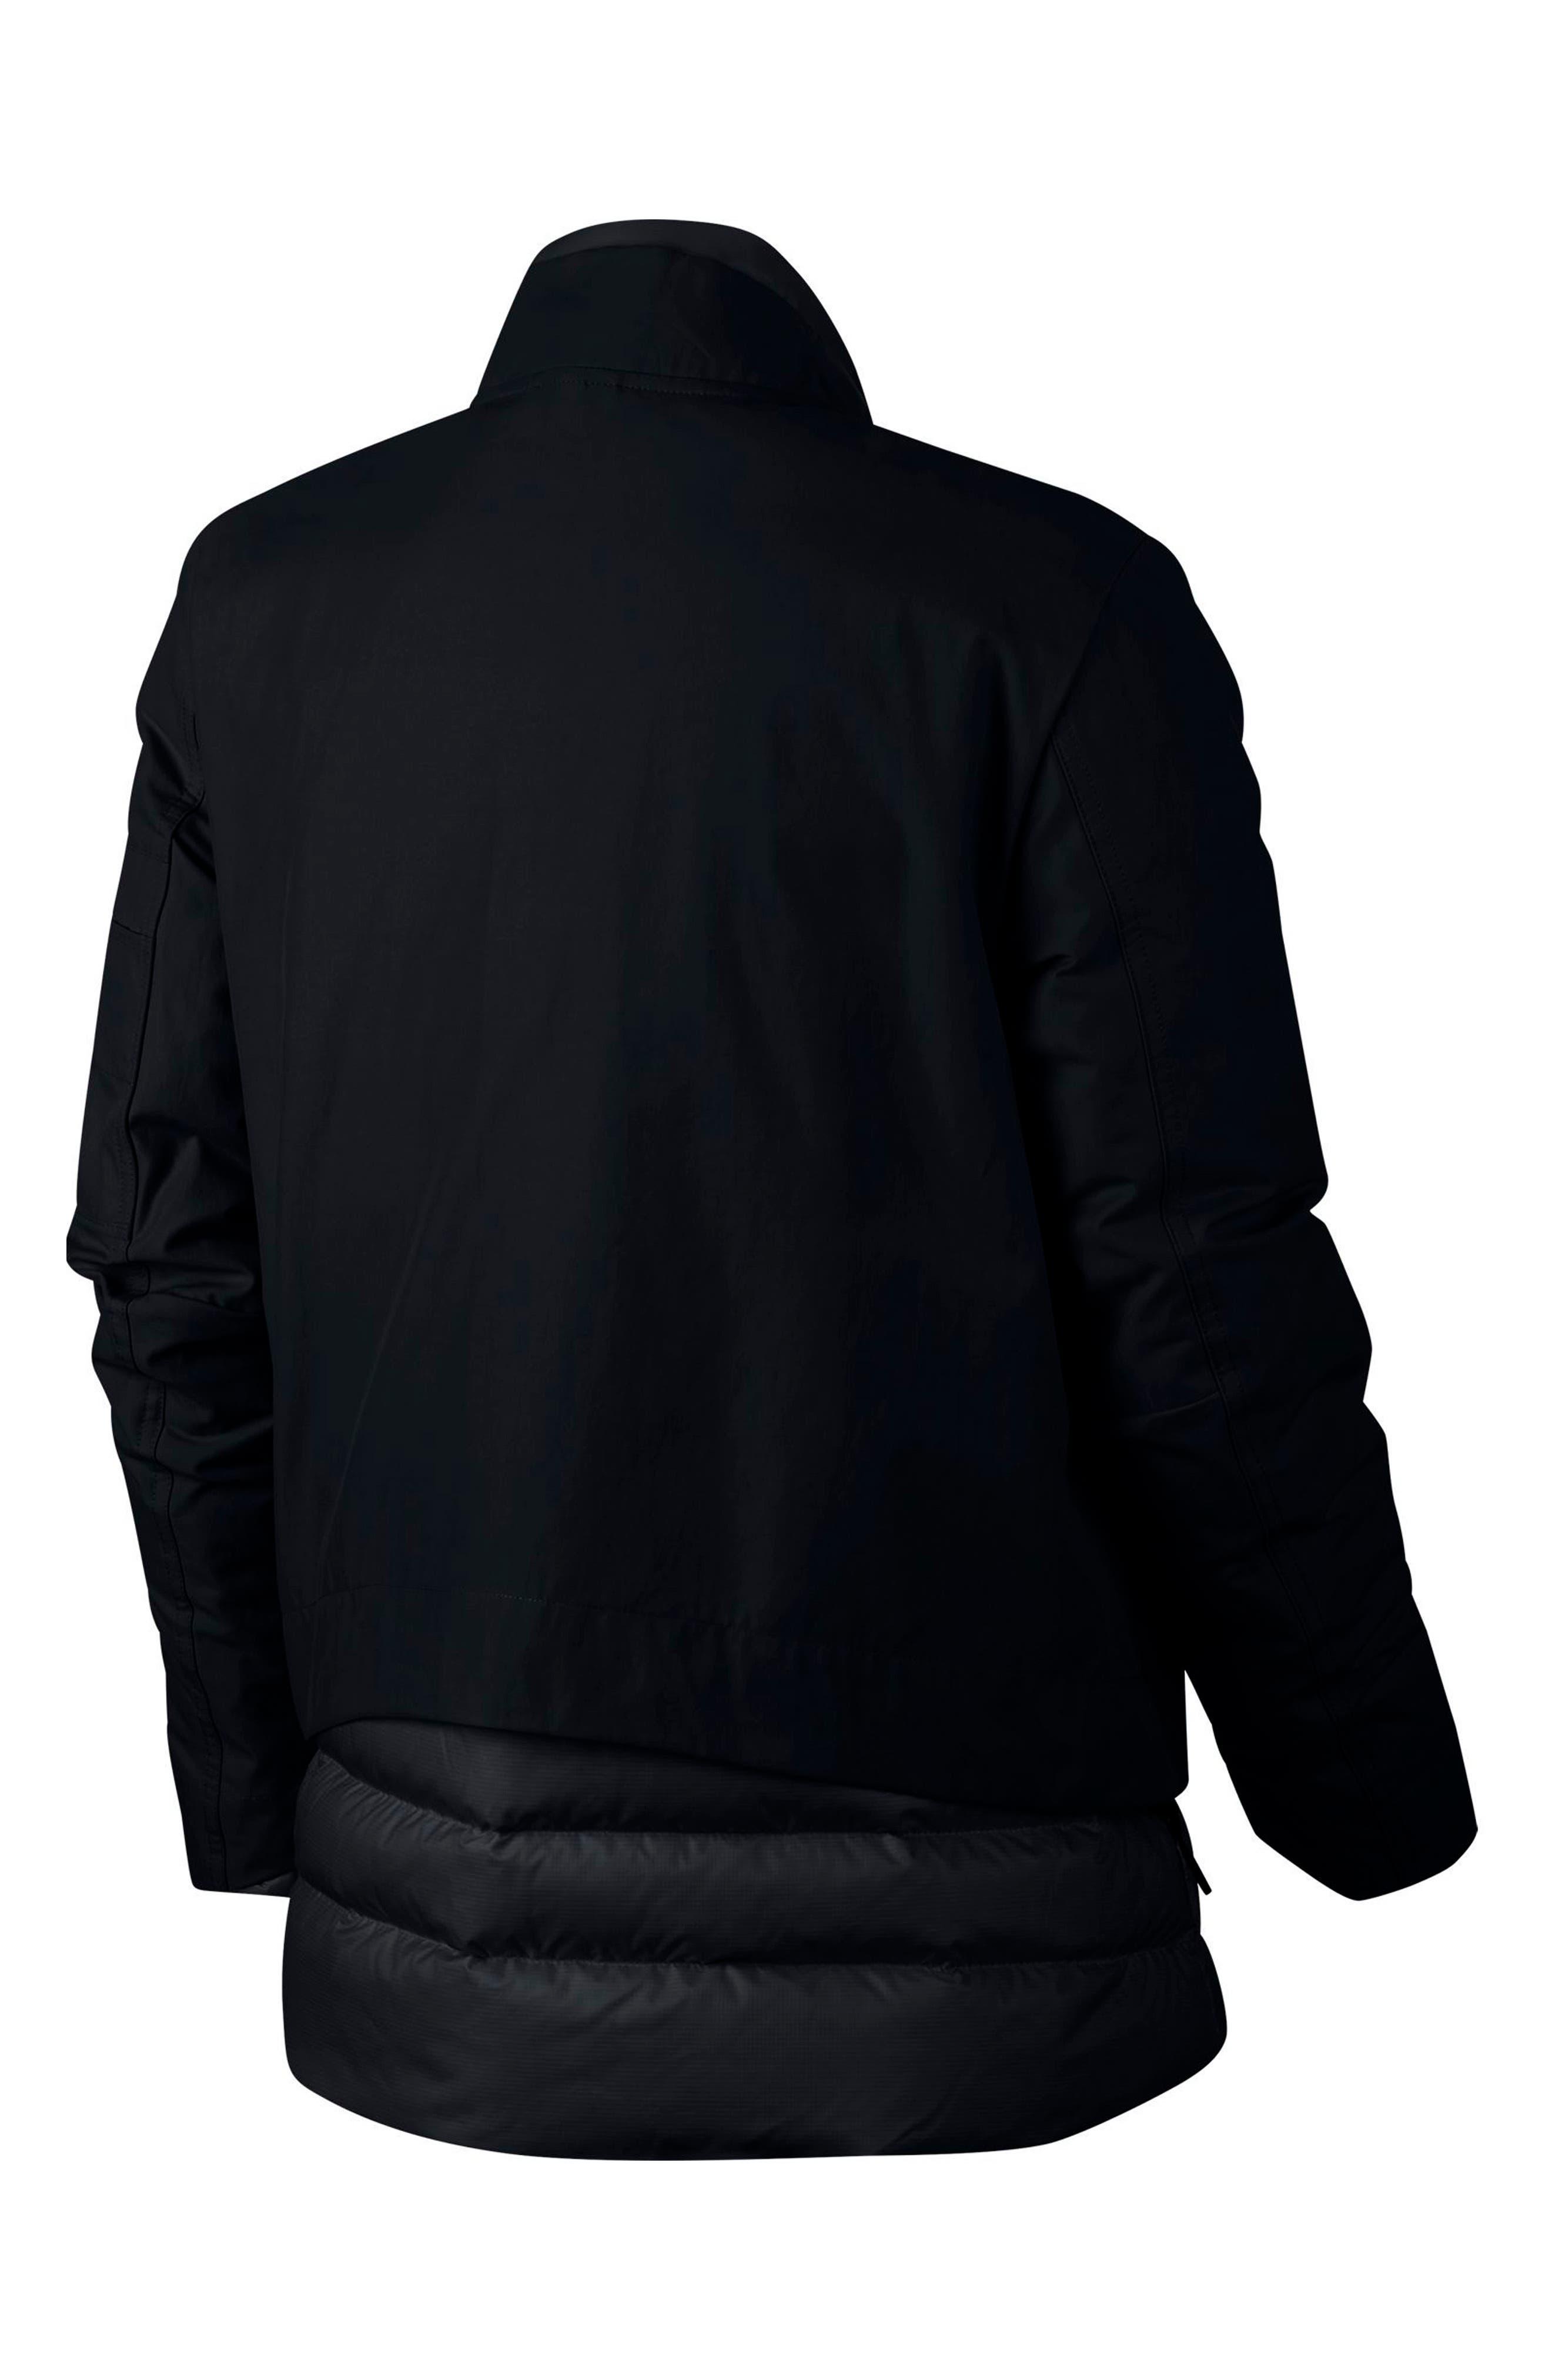 Sportswear AeroLoft 3-in-1 Down Jacket,                             Alternate thumbnail 12, color,                             Black/ Black/ Black